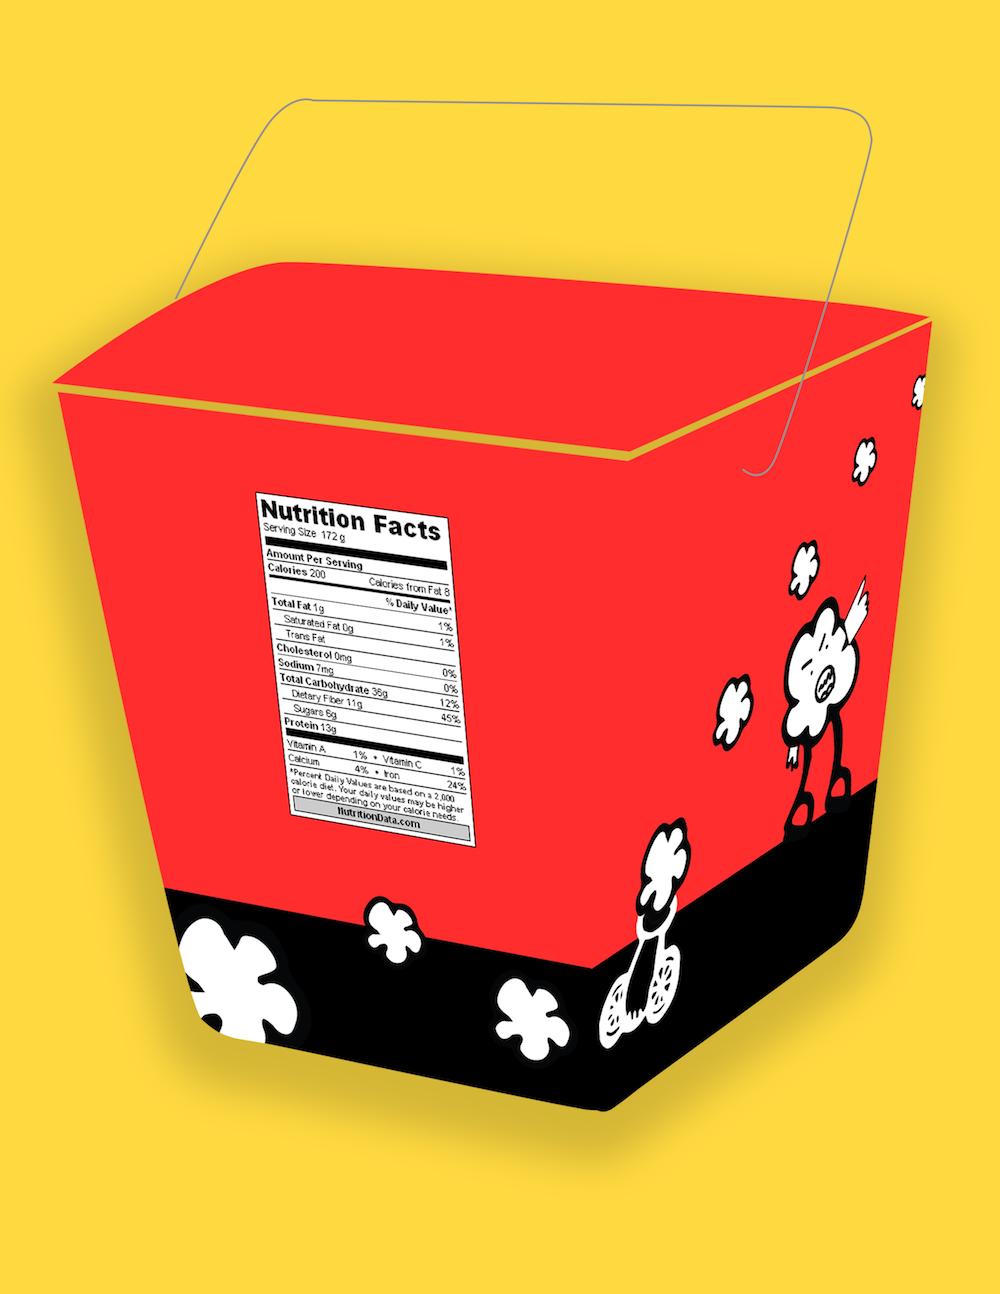 panda-snacks-popcorn_0003_Layer-Comp-4.png